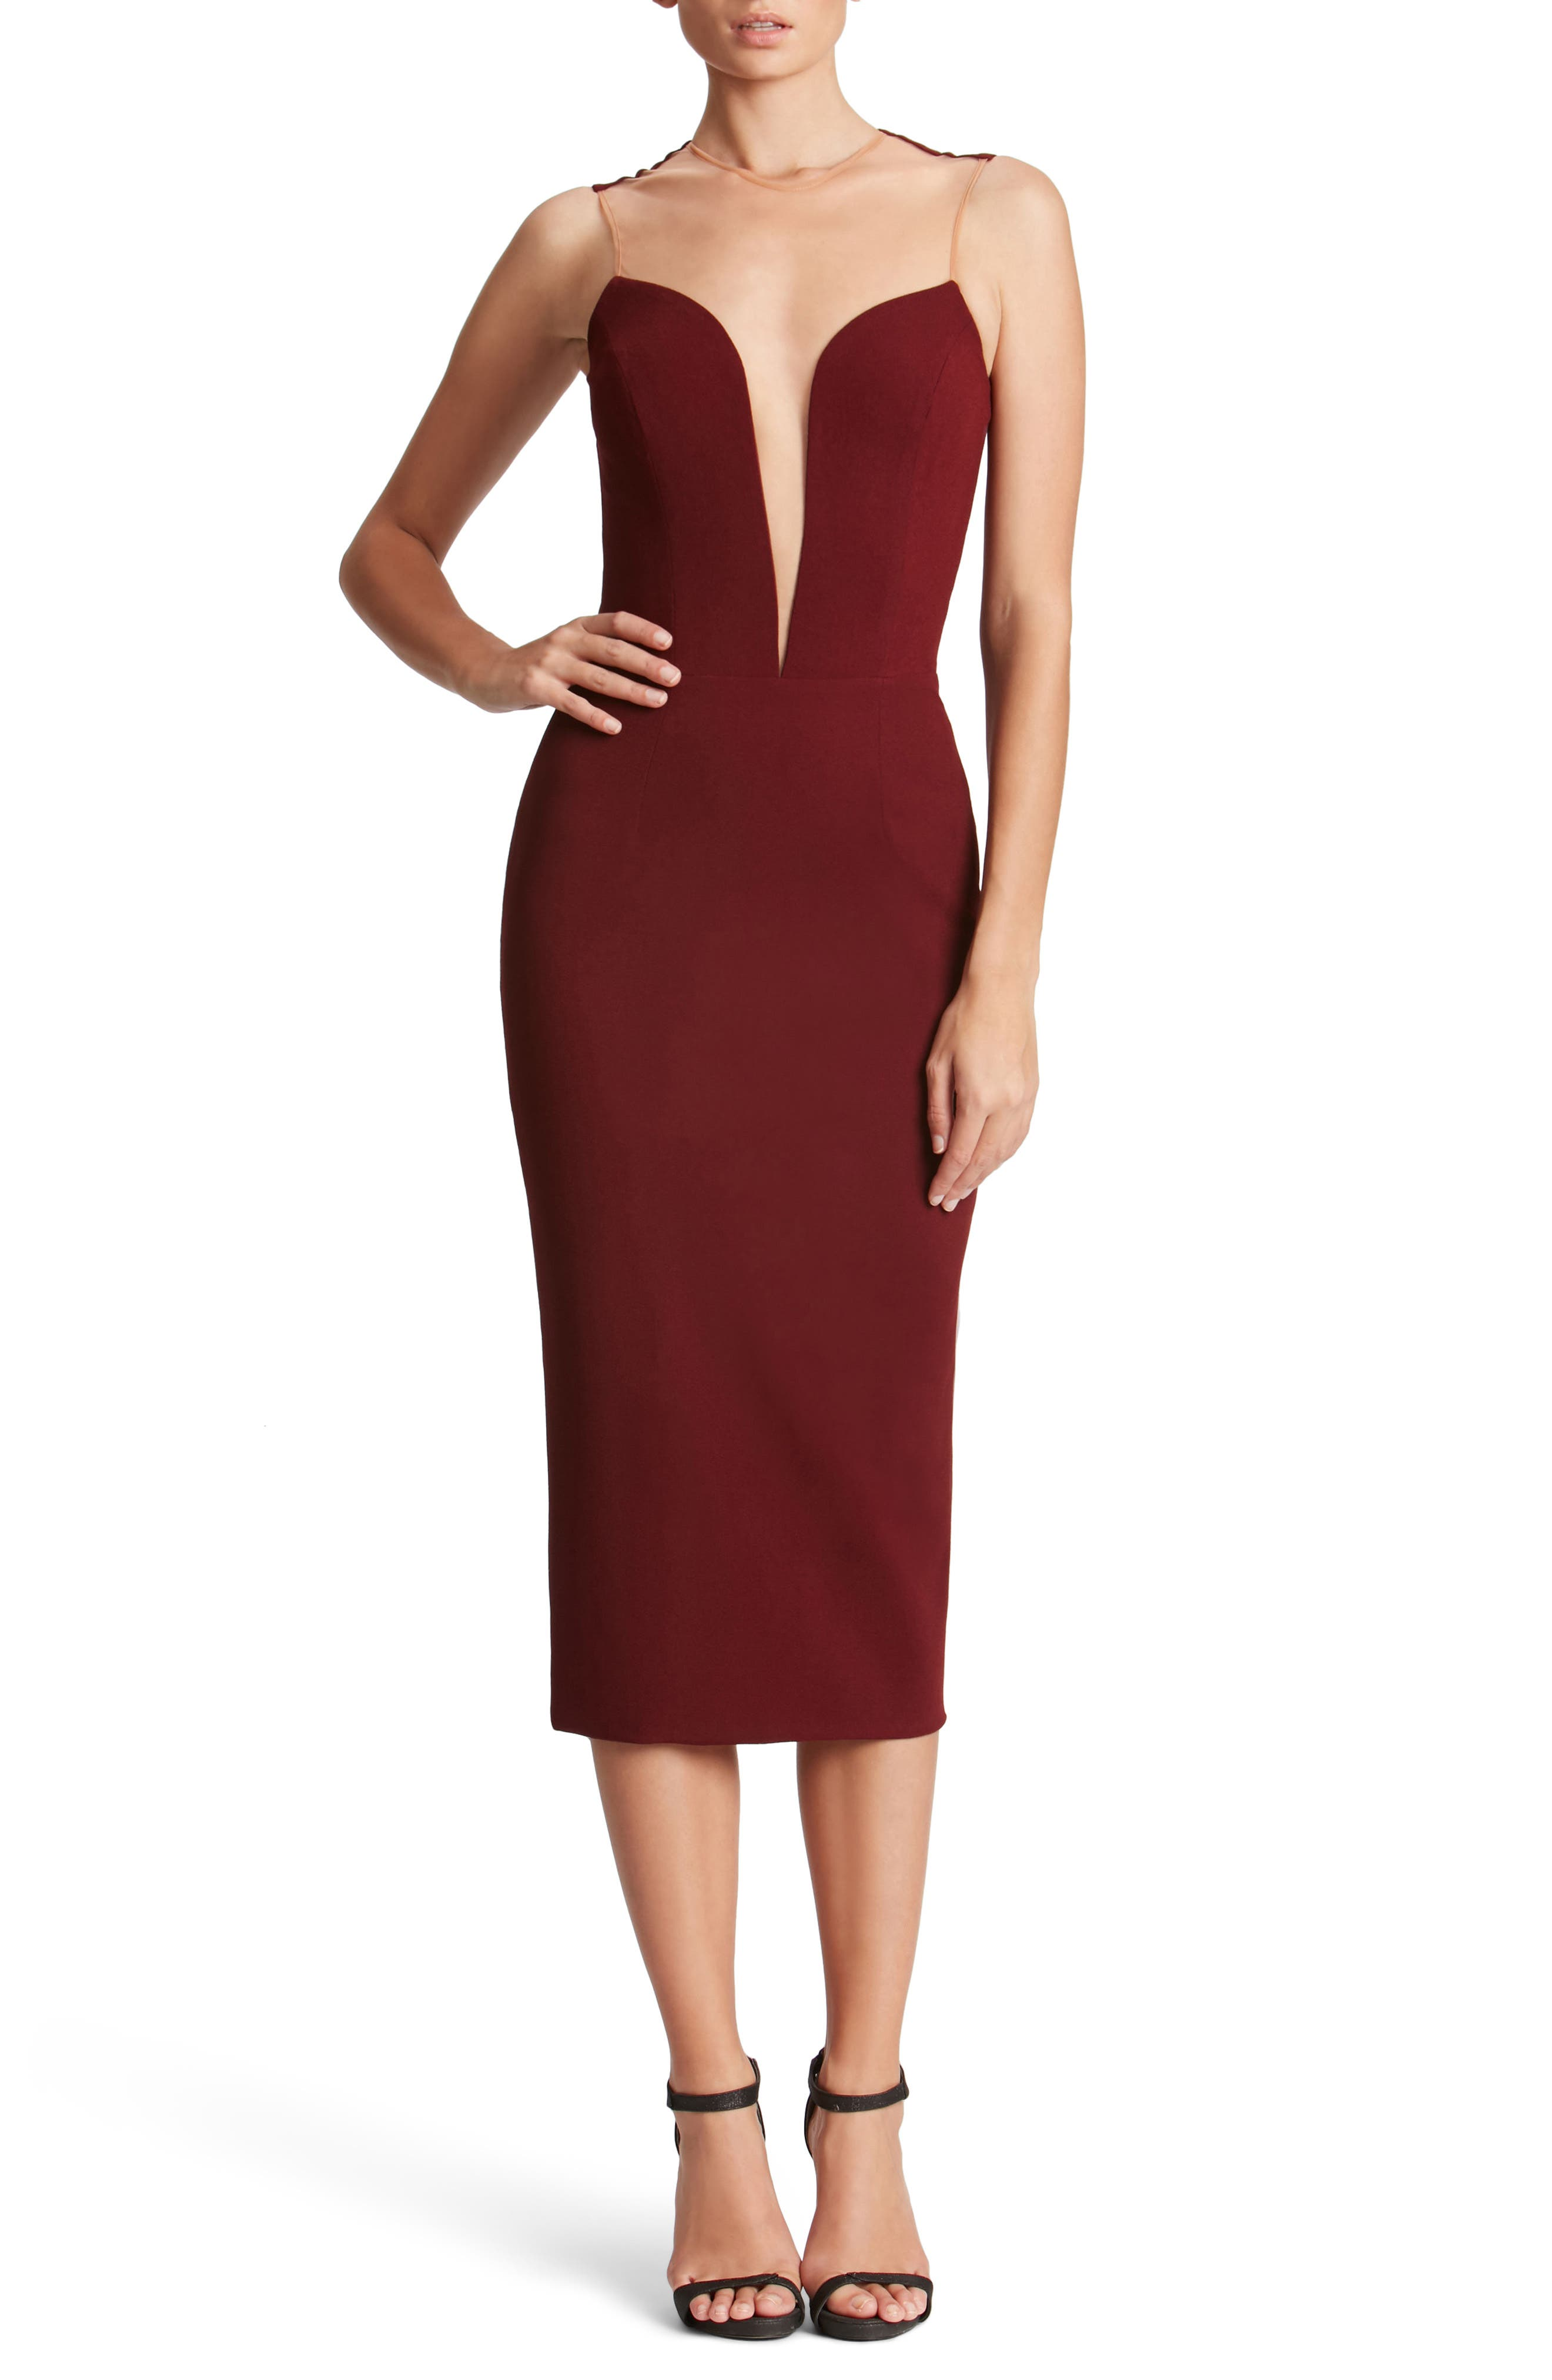 Helen Plunge Neck Midi Dress,                         Main,                         color, Burgundy